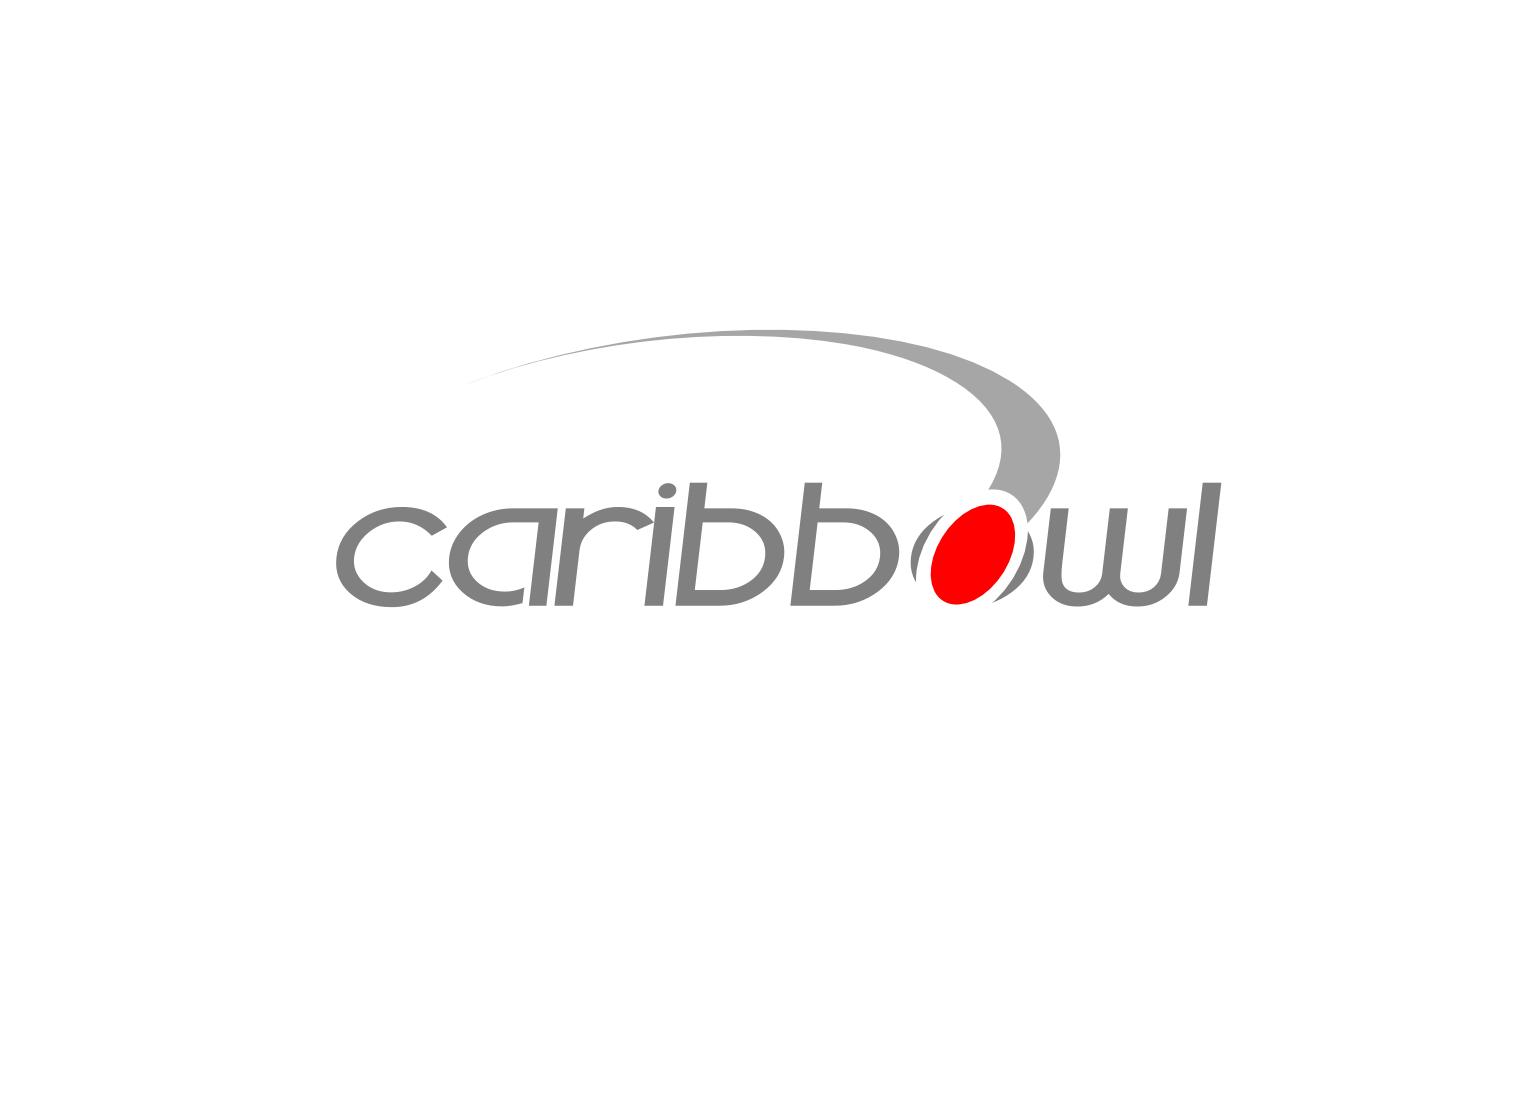 Logo Design by whoosef - Entry No. 40 in the Logo Design Contest Fun Logo Design for Caribbowl.